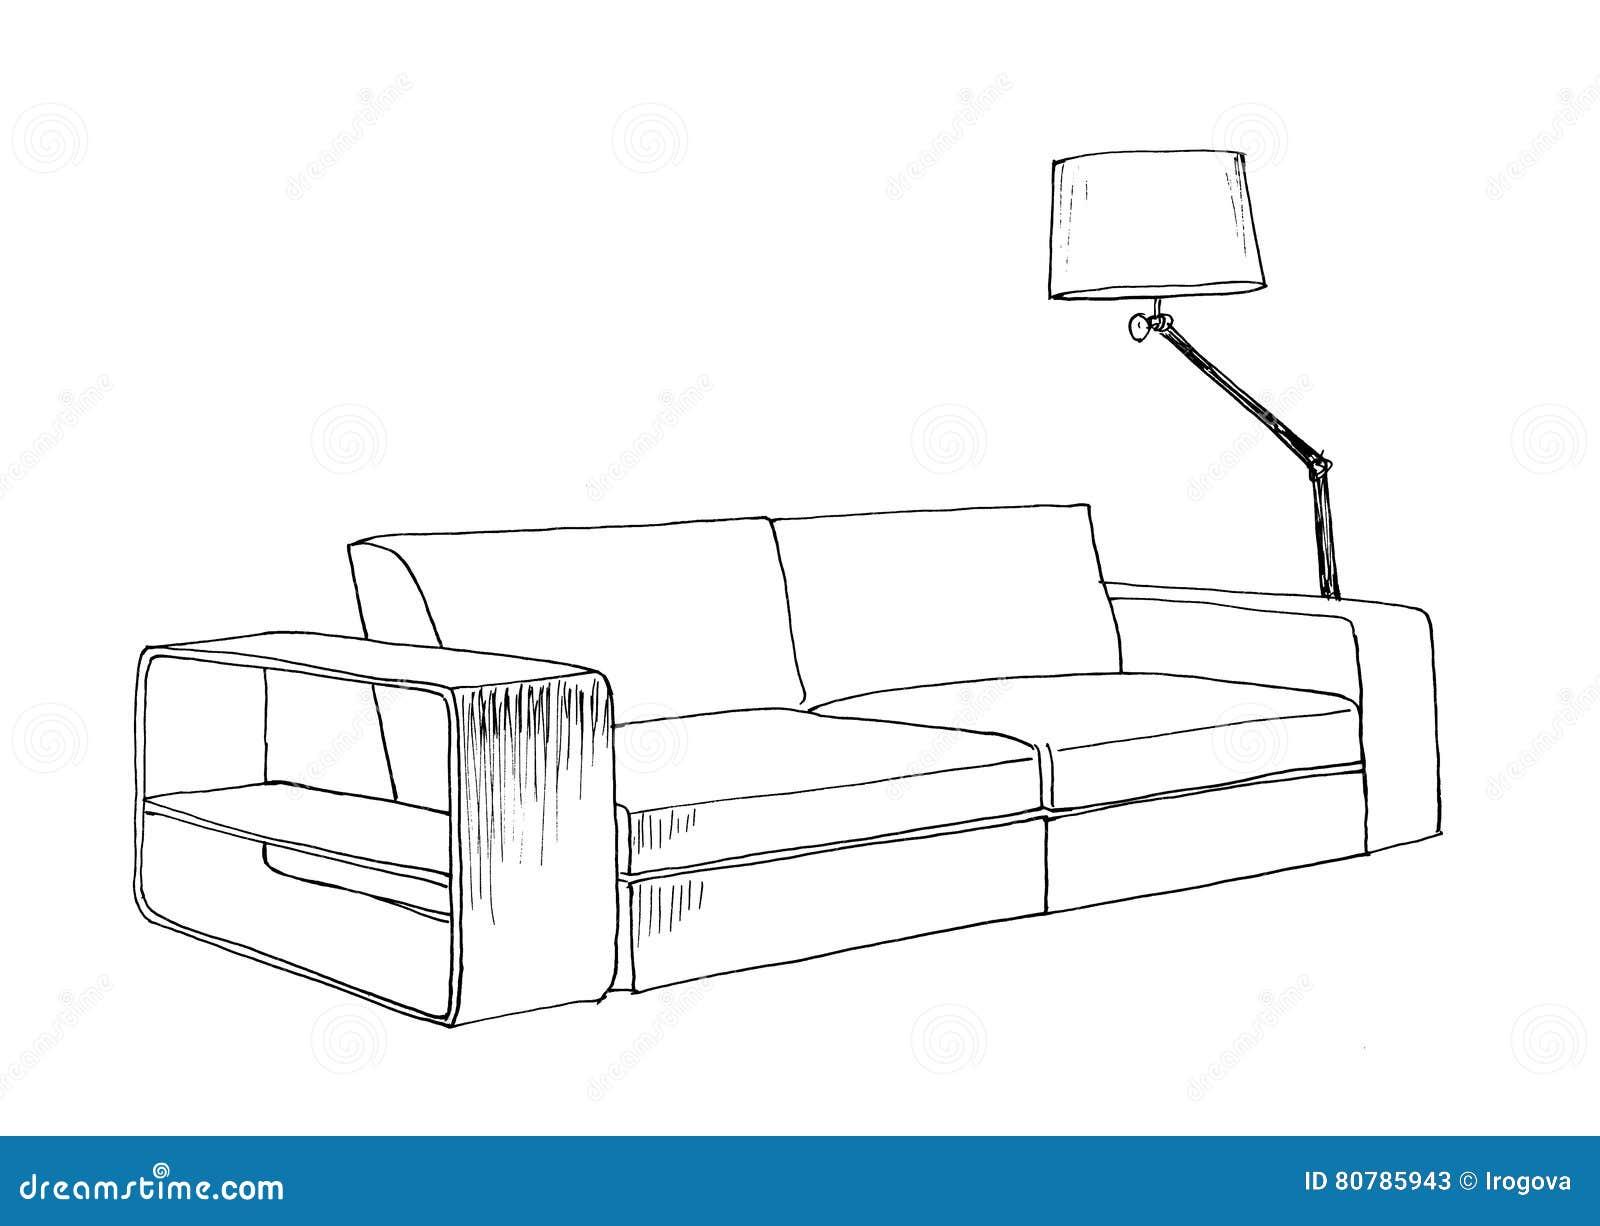 Line Art Floors : Graphical sketch of modern sofa stock illustration image